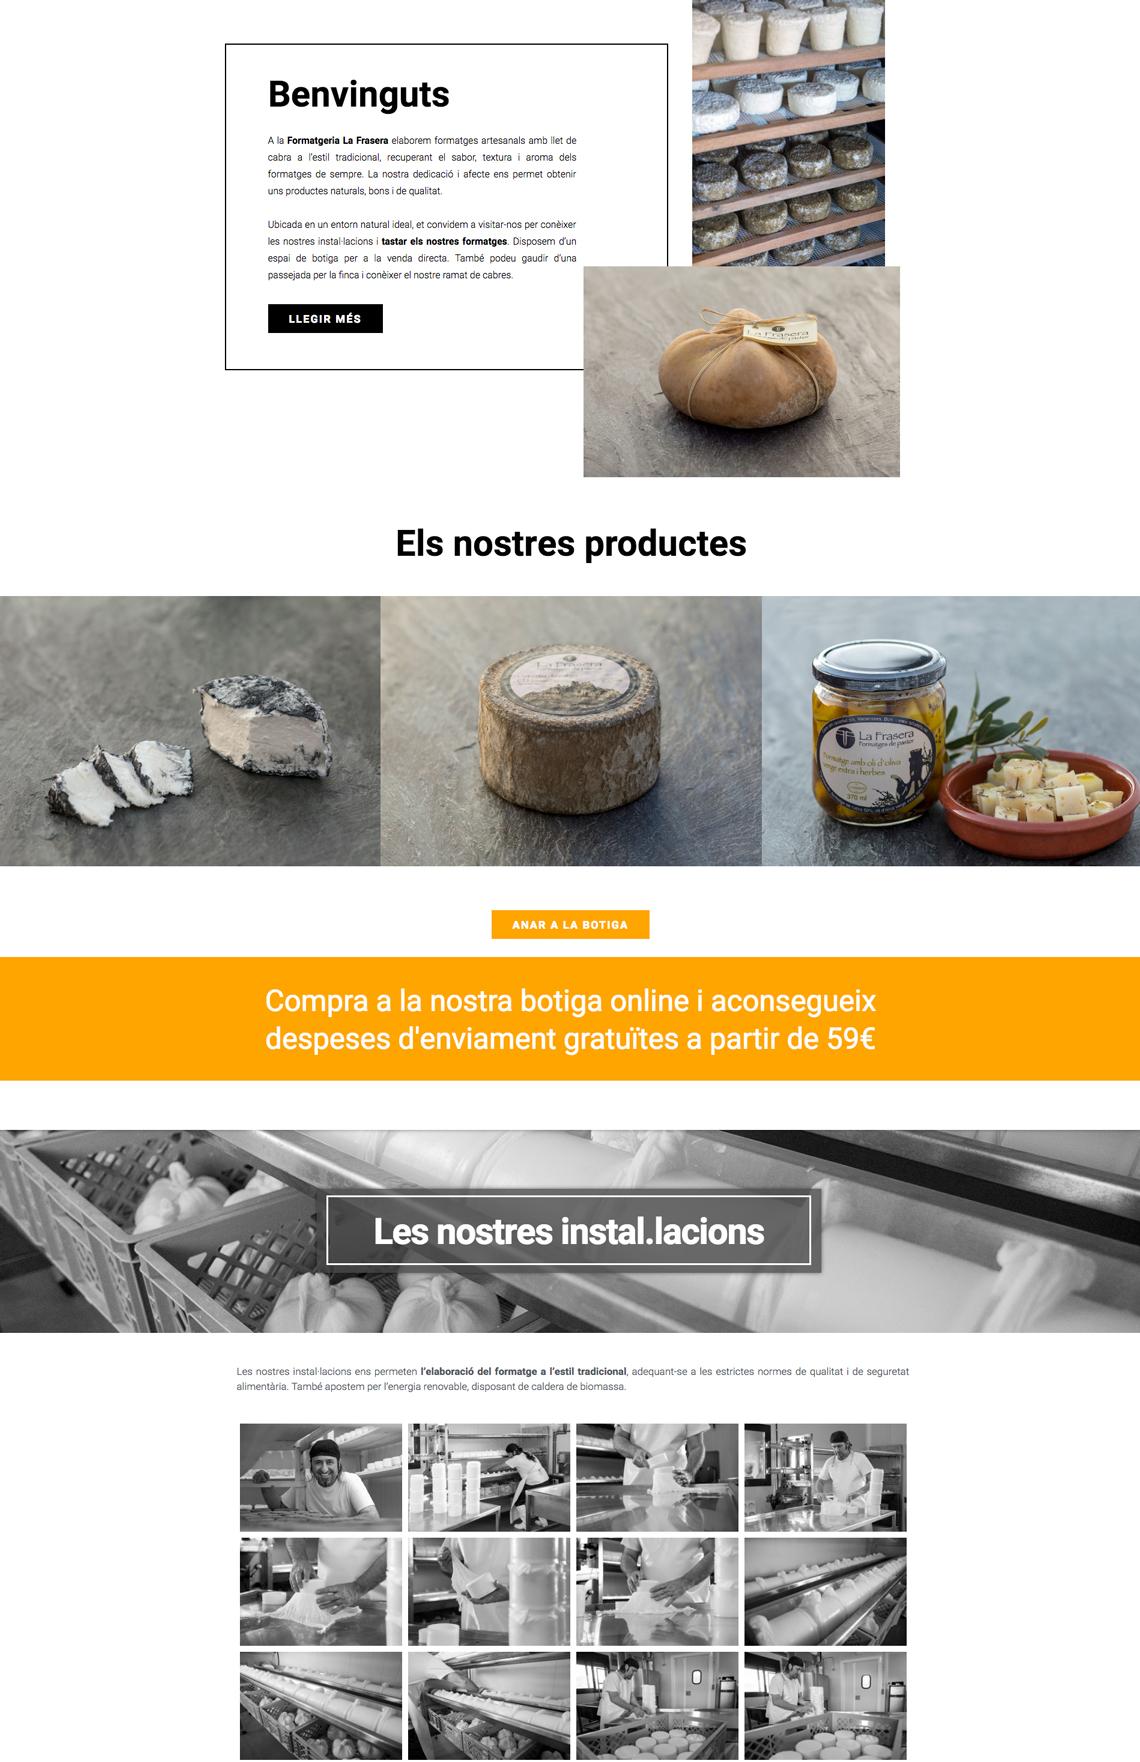 Brandall Agency Project La Frasera Website